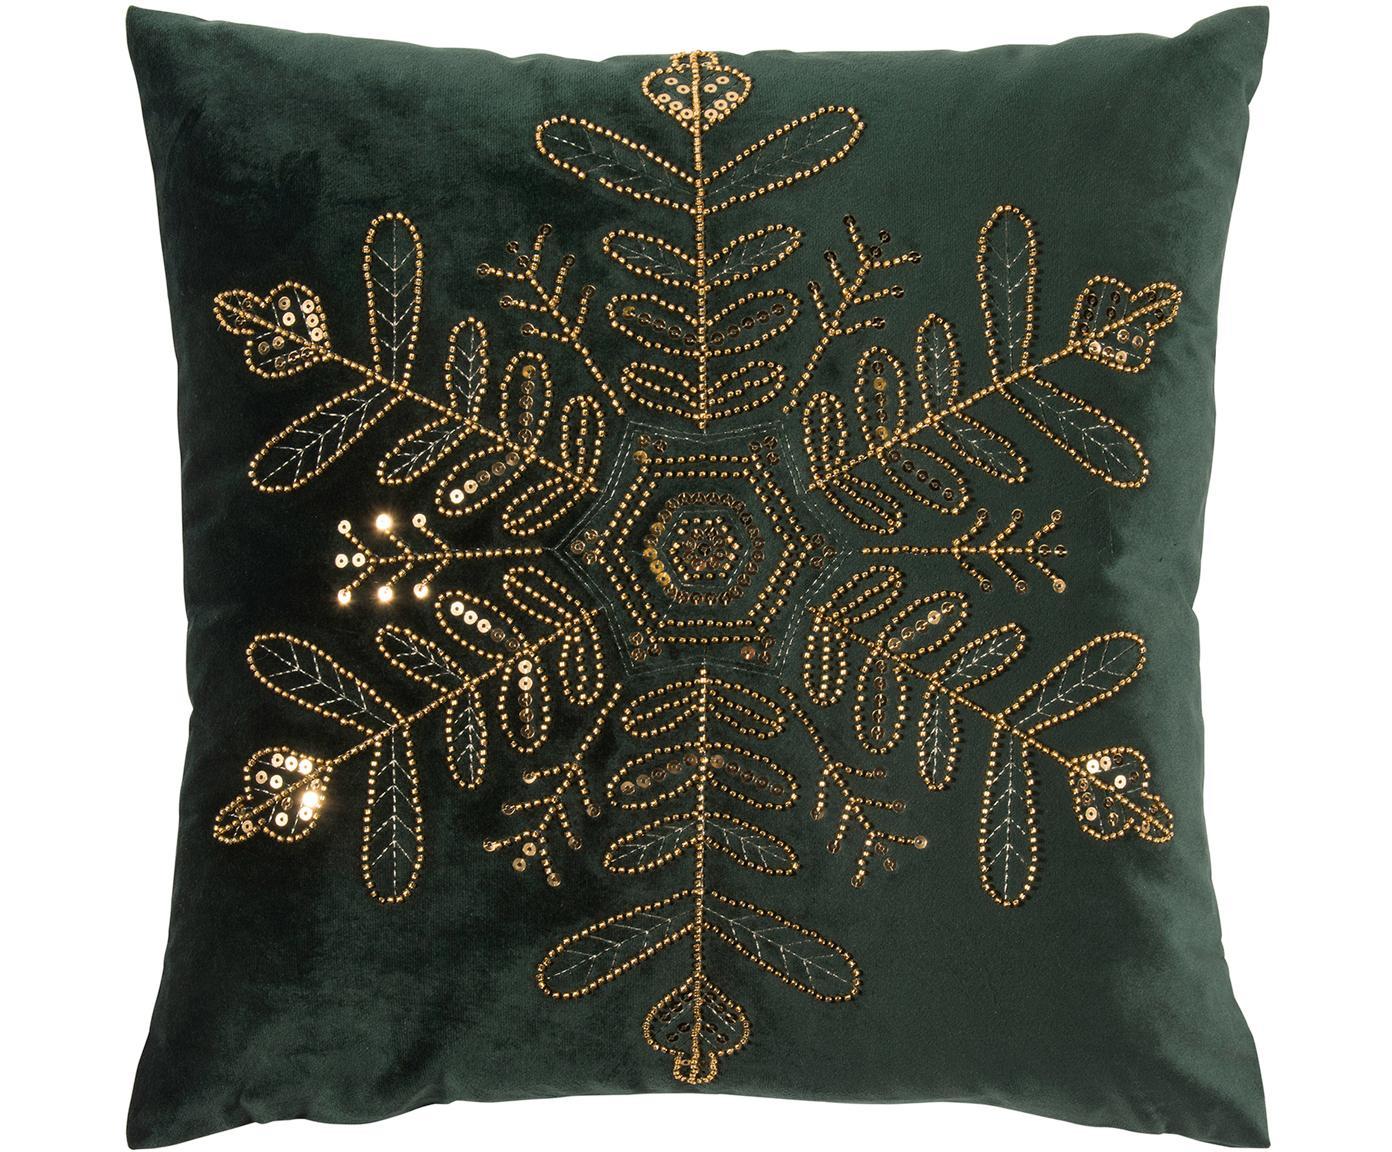 Samt-Kissenhülle Sparkle mit besticktem Perlen-Motiv, Polyestersamt, Dunkelgrün, Goldfarben, 45 x 45 cm